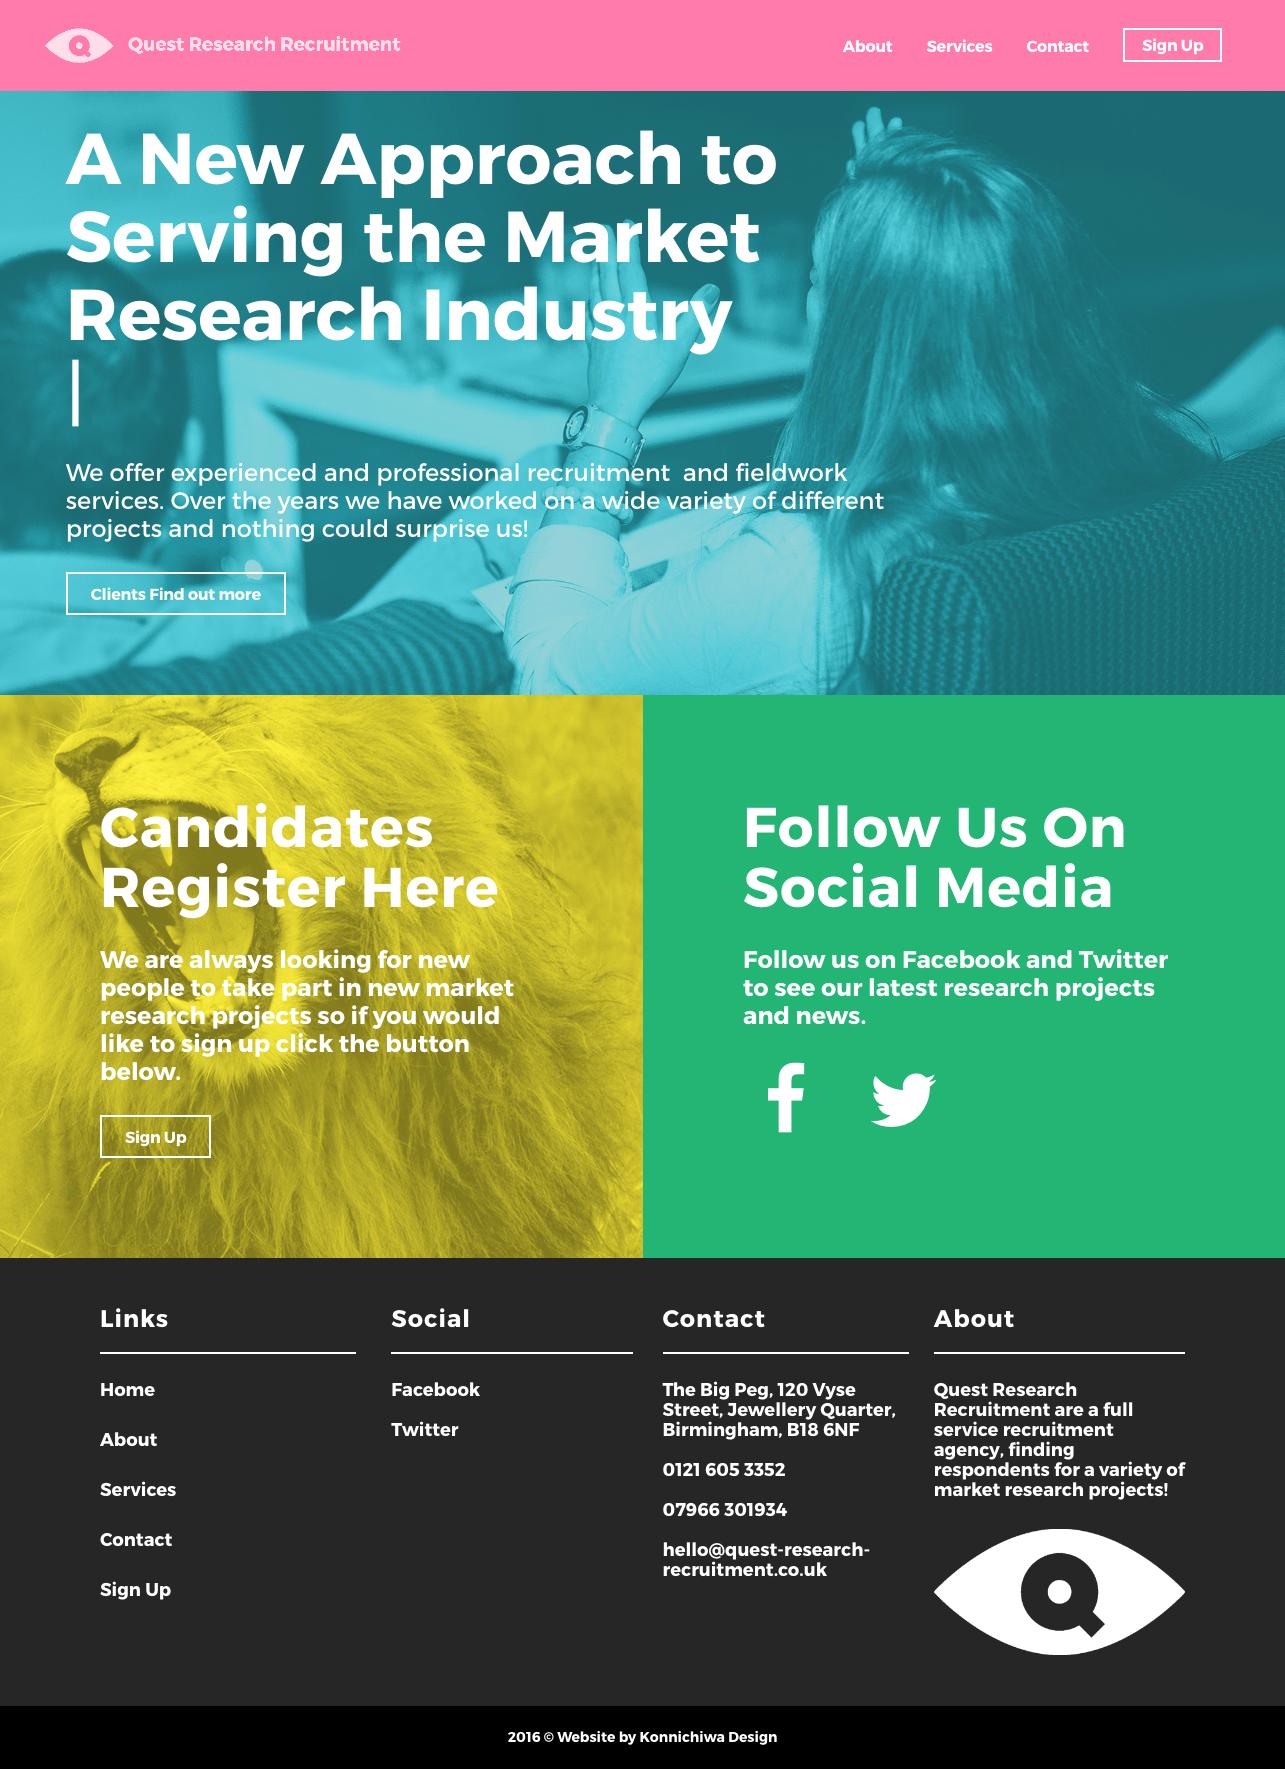 screencapture-quest-research-recruitment-co-uk-1479724349420